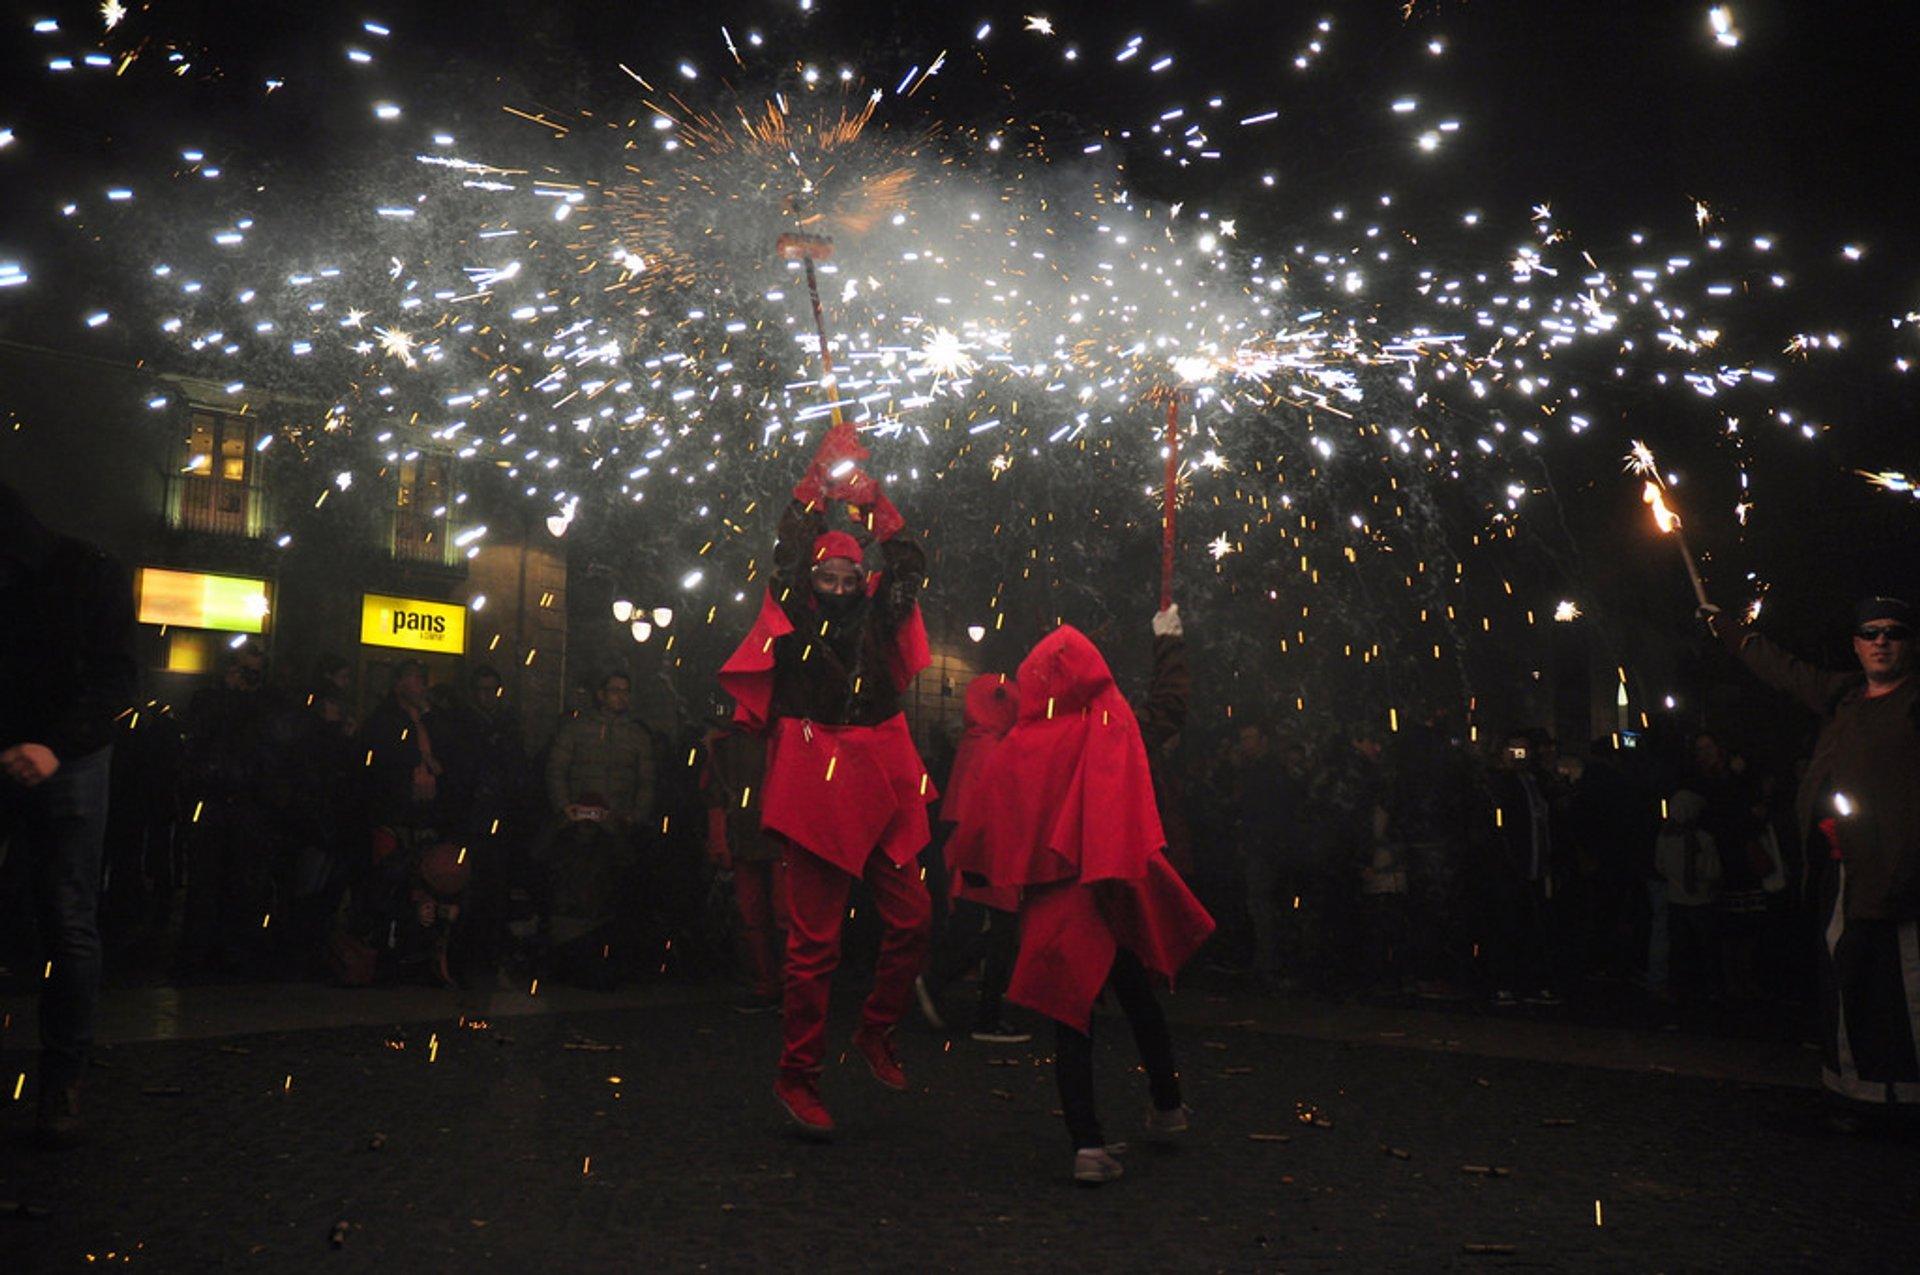 Fiesta de Santa Eulalia in Barcelona 2019 - Best Time